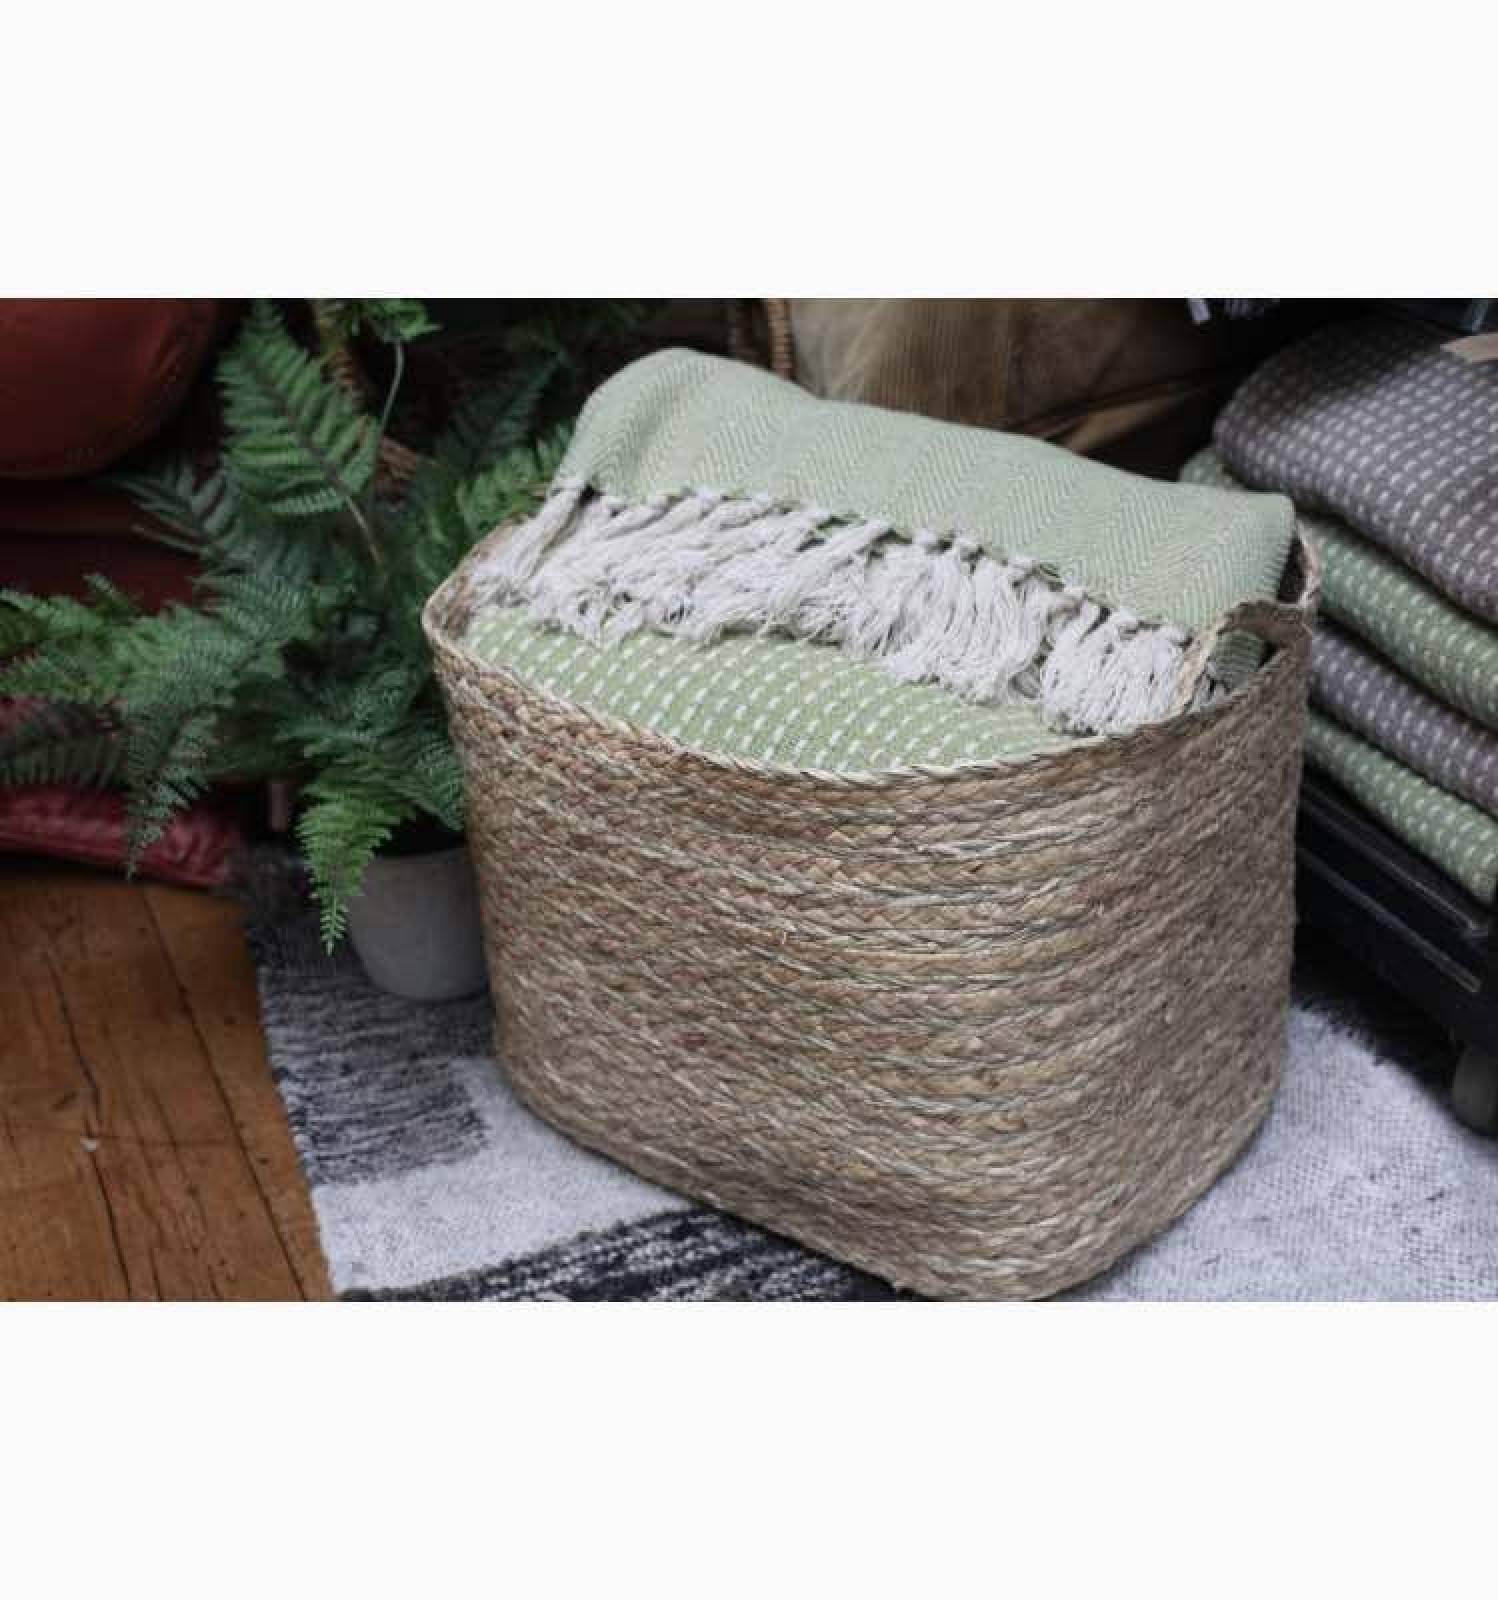 Rectangular Basket With Handles thumbnails